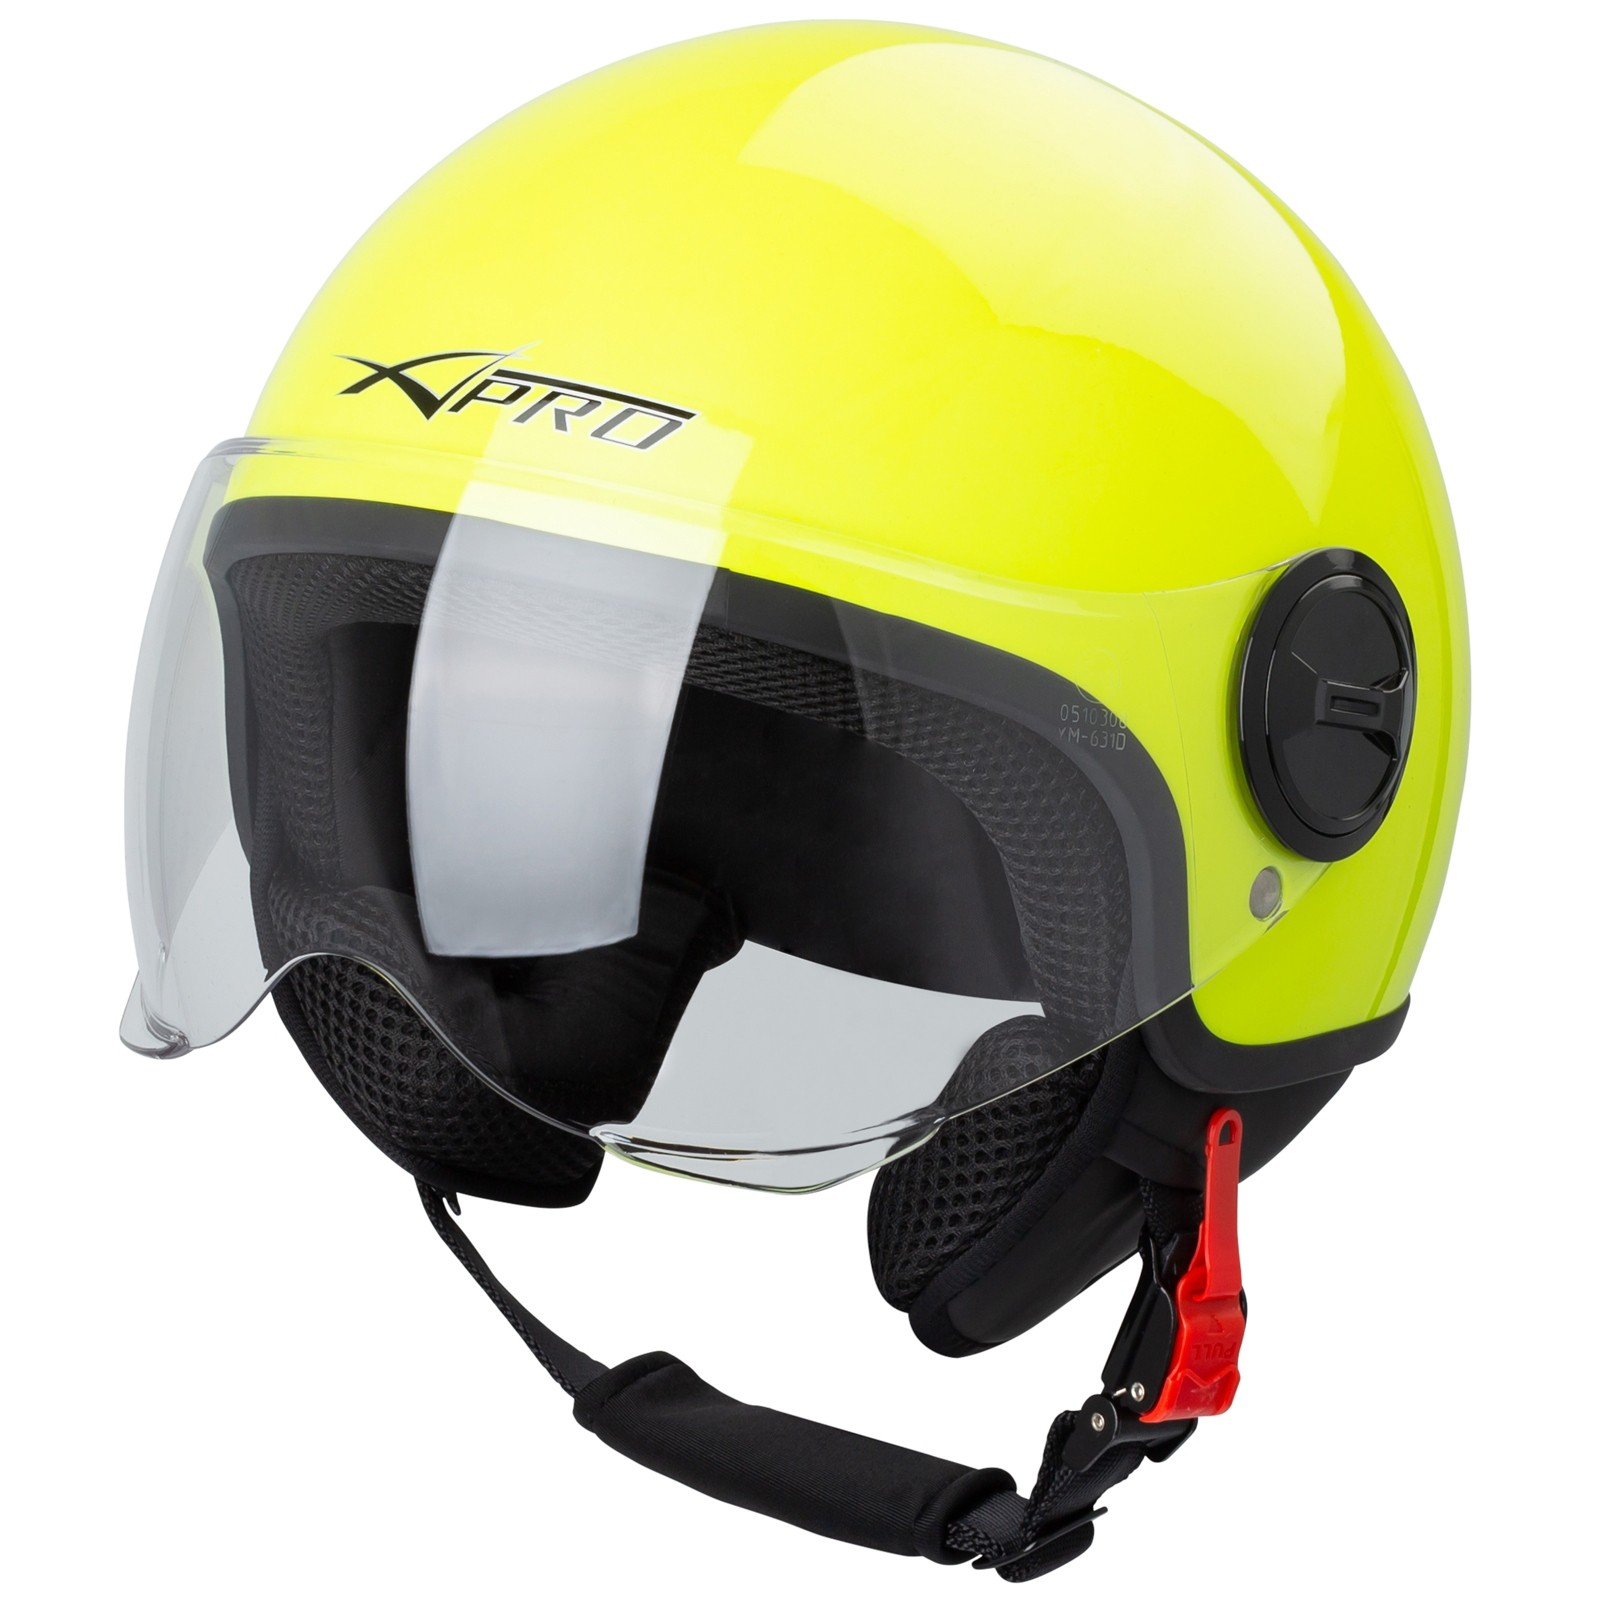 Zoom-Helmet-Casco-Sonic-Moto-A-Pro-Motorcycle-Fluo-Giallo-Front